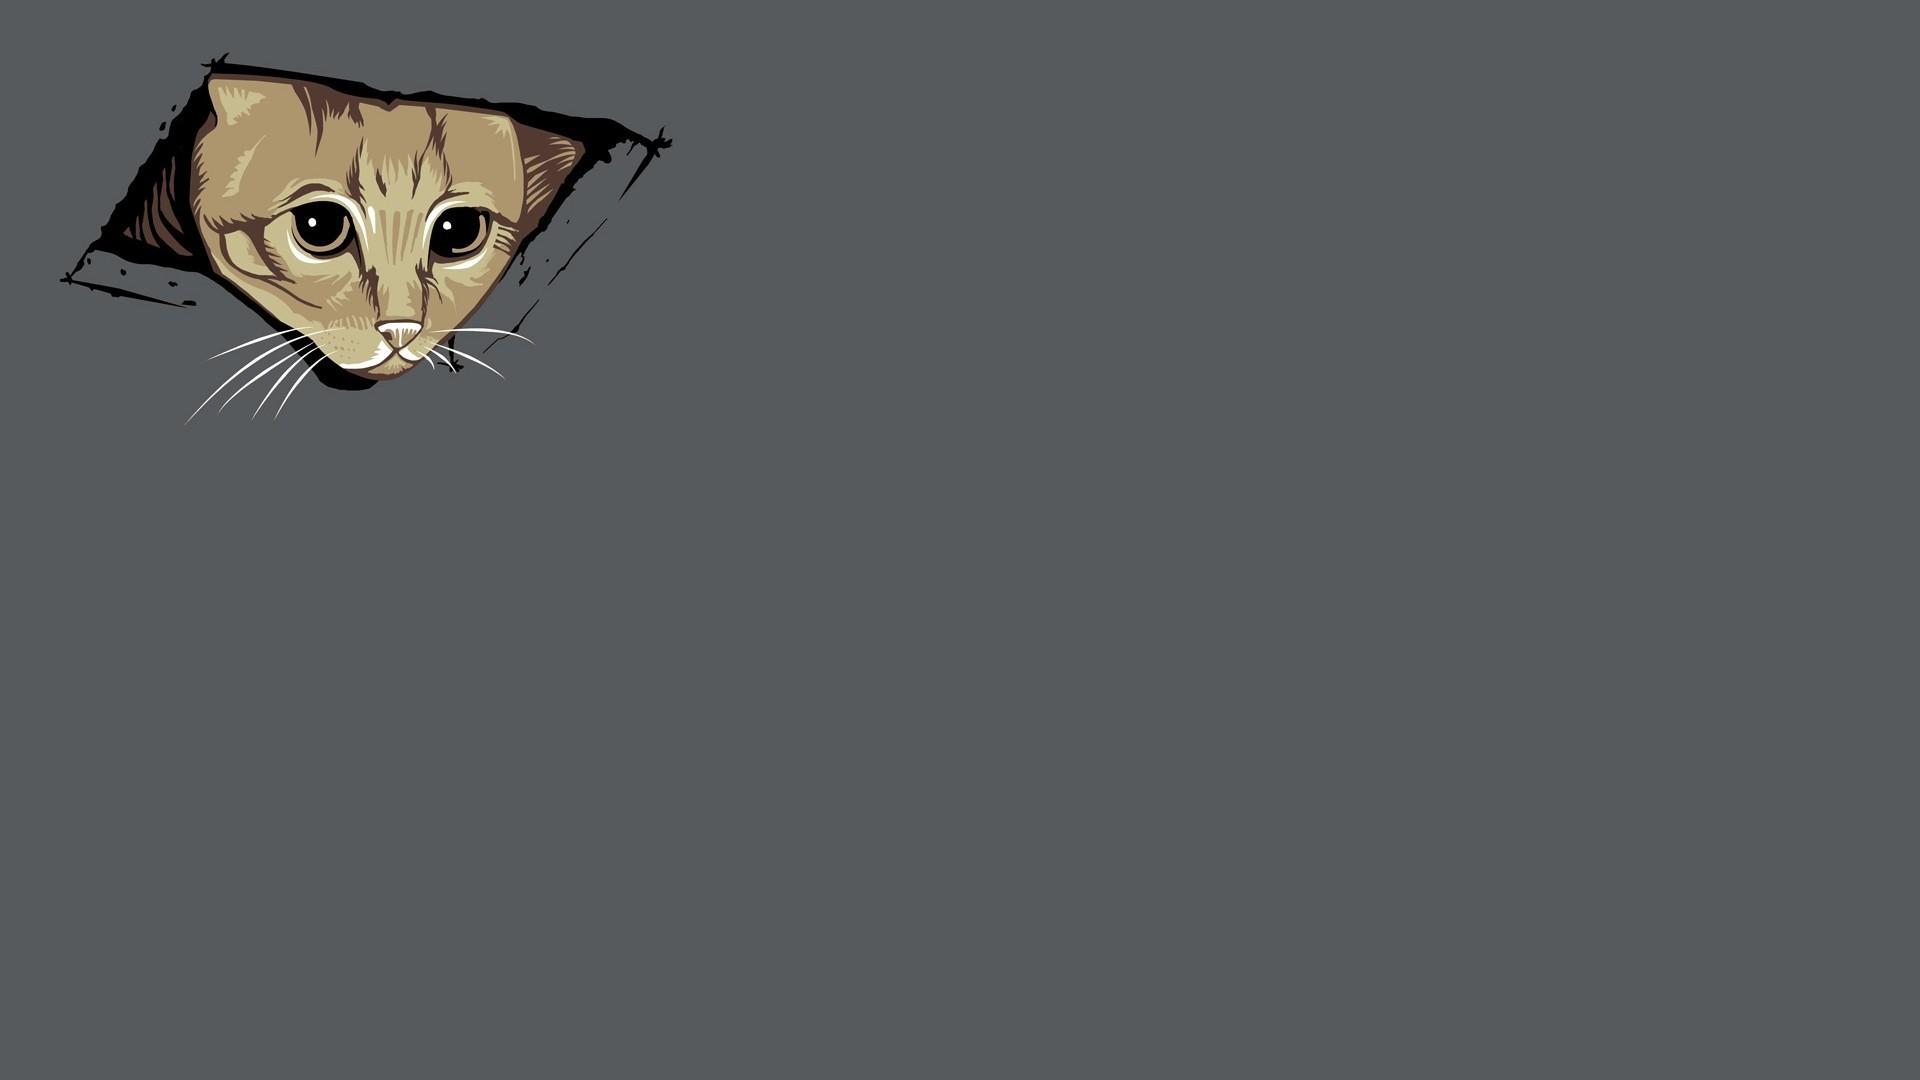 Abstract cats kittens simple simplistic wallpaper   AllWallpaper